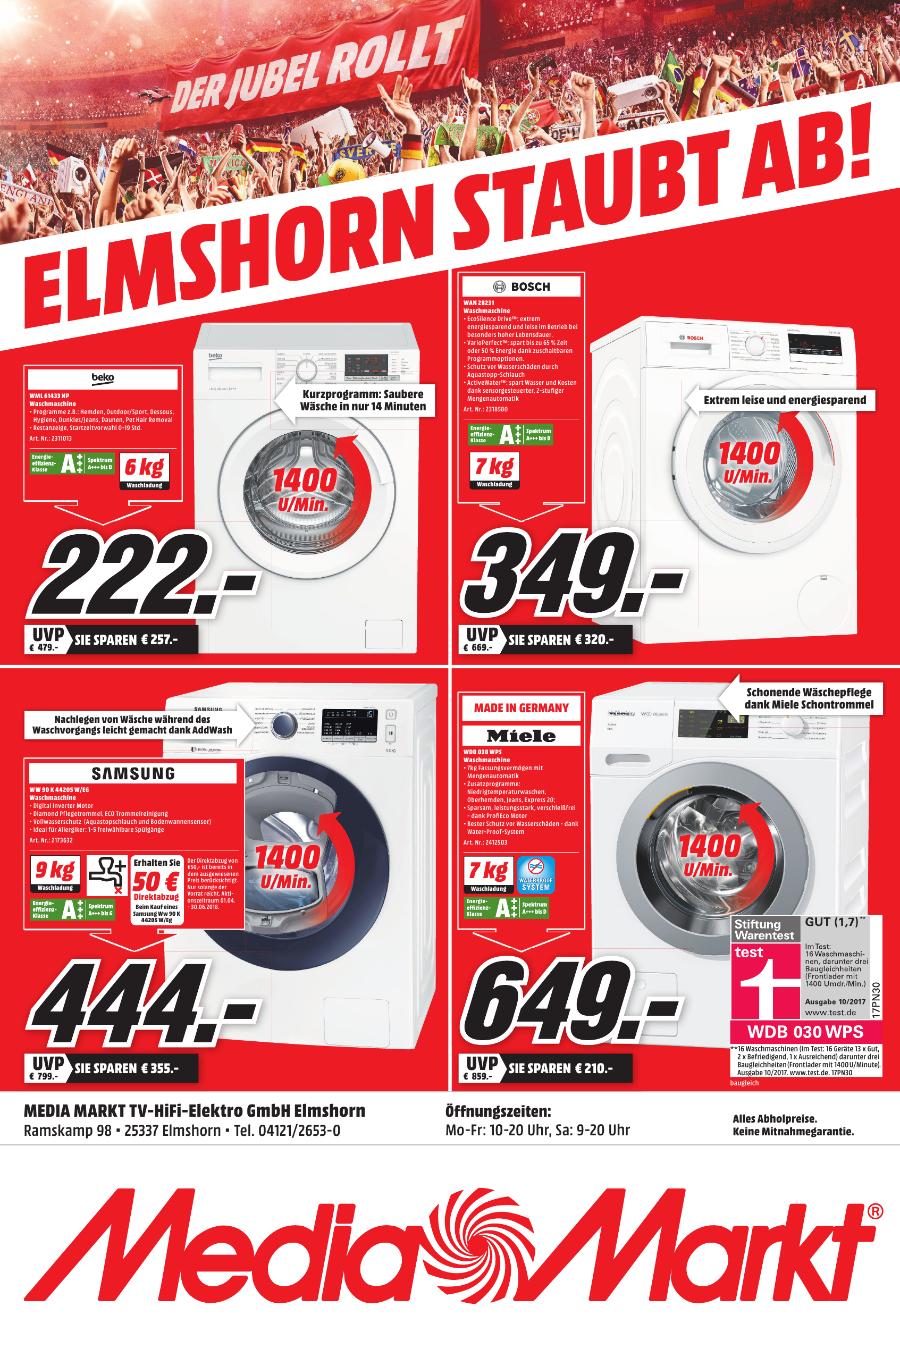 (Lokal MM Elmshorn) Miele WDB 030 WPS Waschmaschine